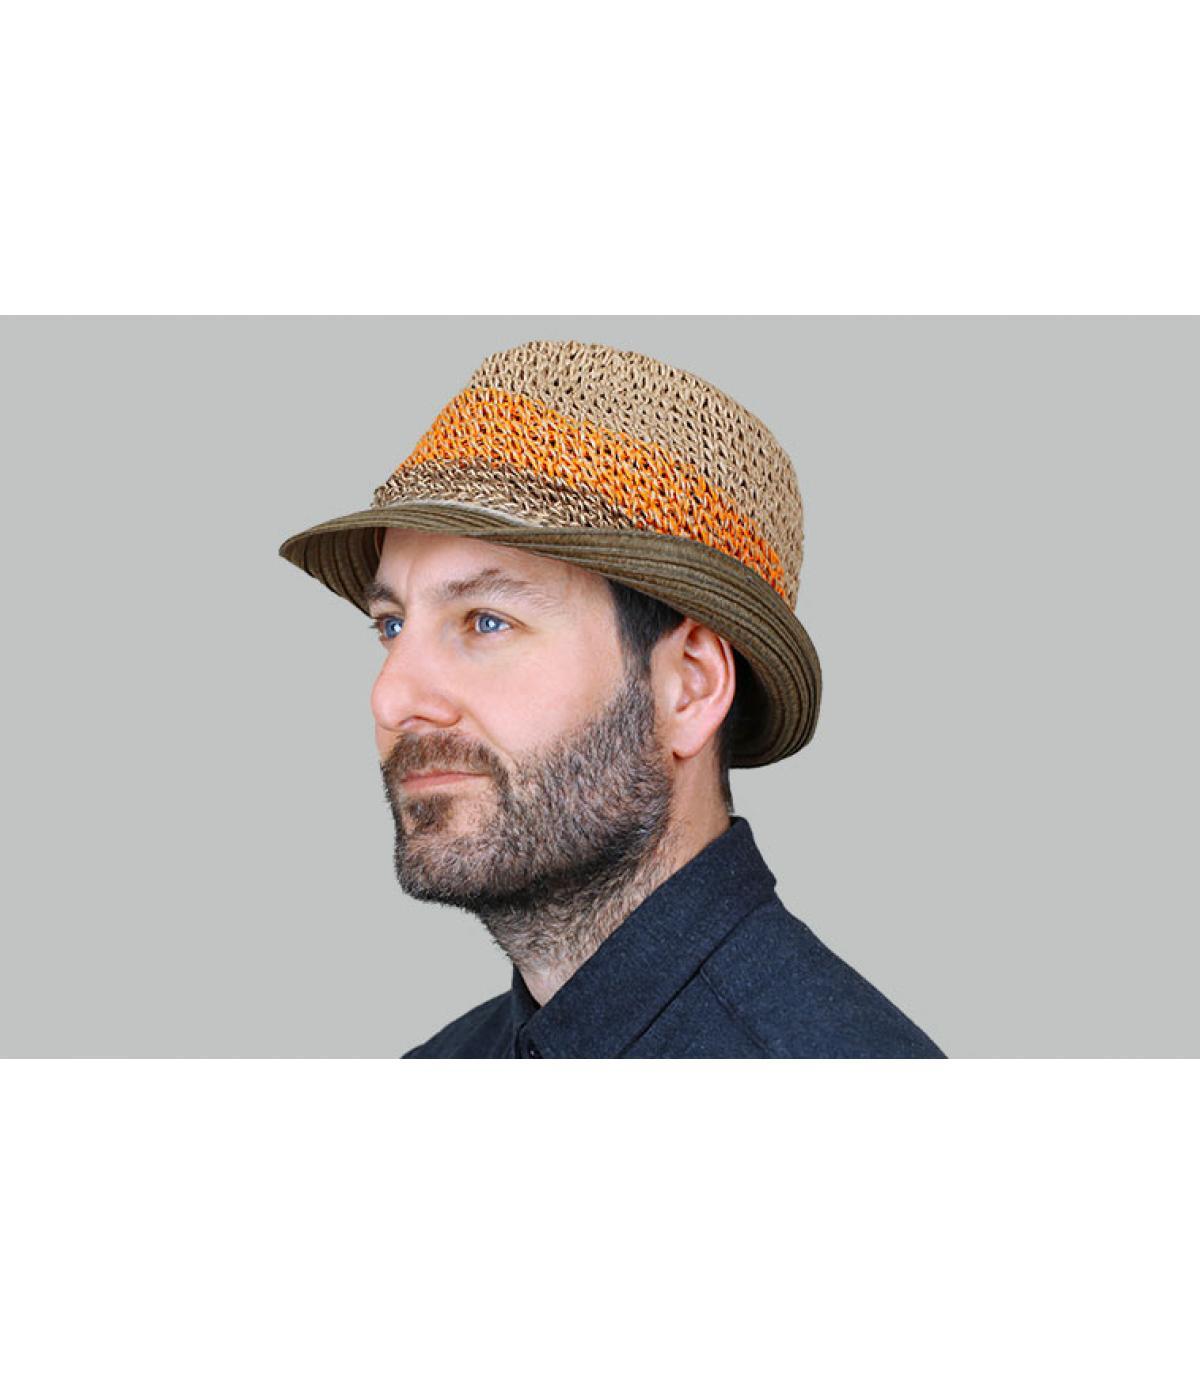 2bc49b21a21fb Sombrero Trilby - Compra venta de Sombreros Trilby. Primera ...